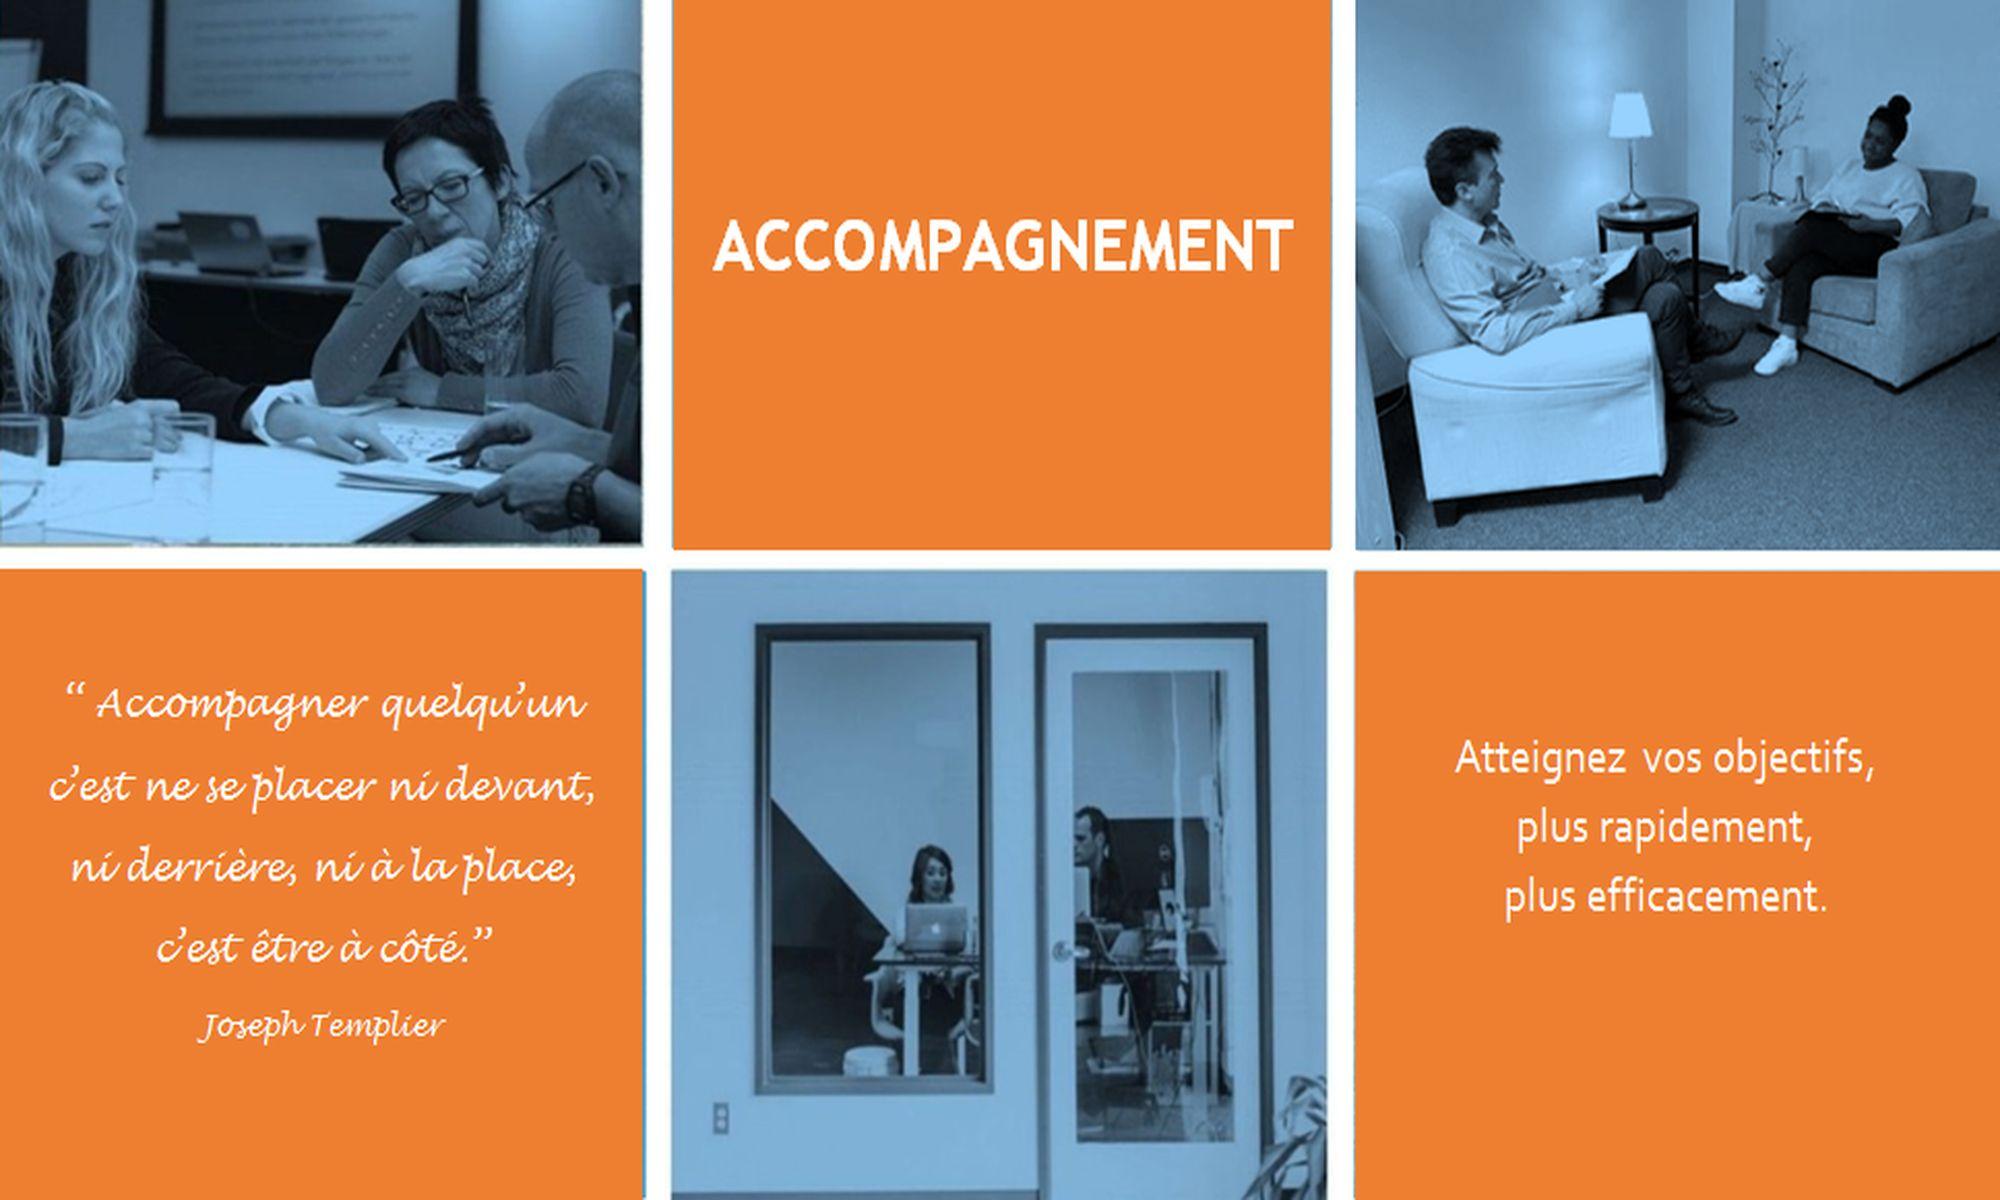 accompagnement-RH-pluriel-developpement-coaching-codeveloppement-cellule-ecoute-groupe-parole